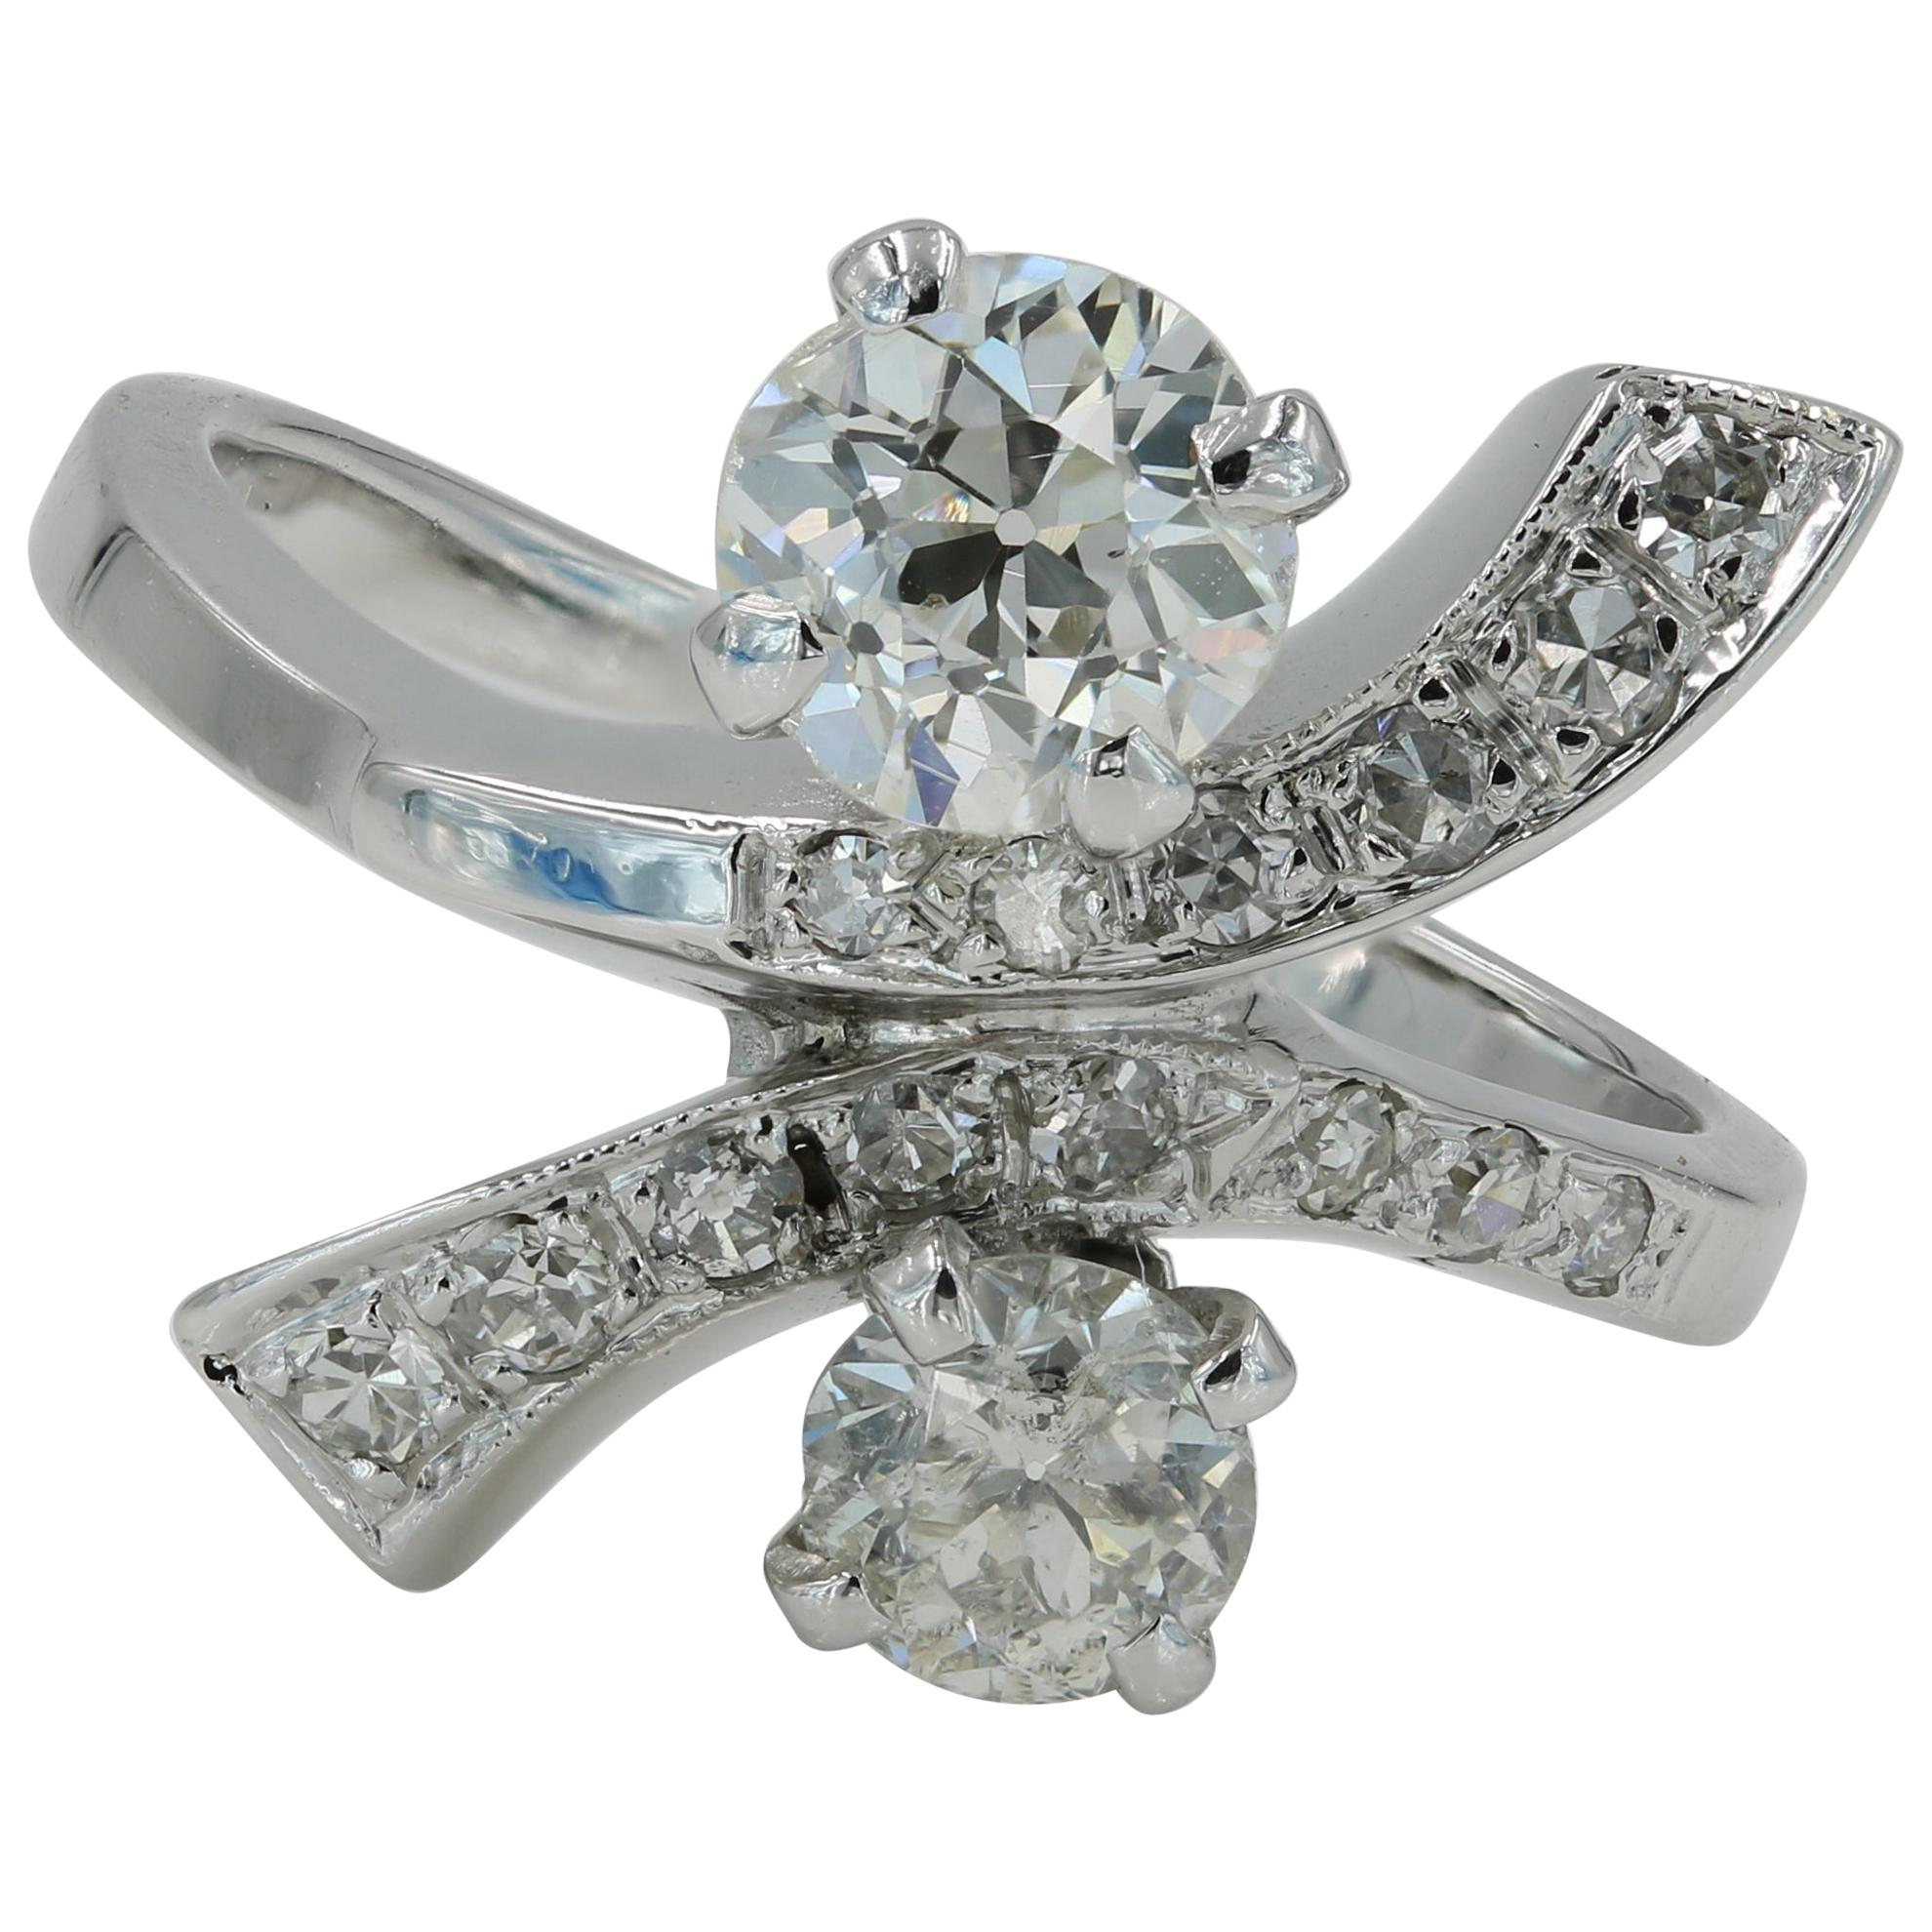 European Cut Diamond Estate Twist Ring in 14 Karat White Gold